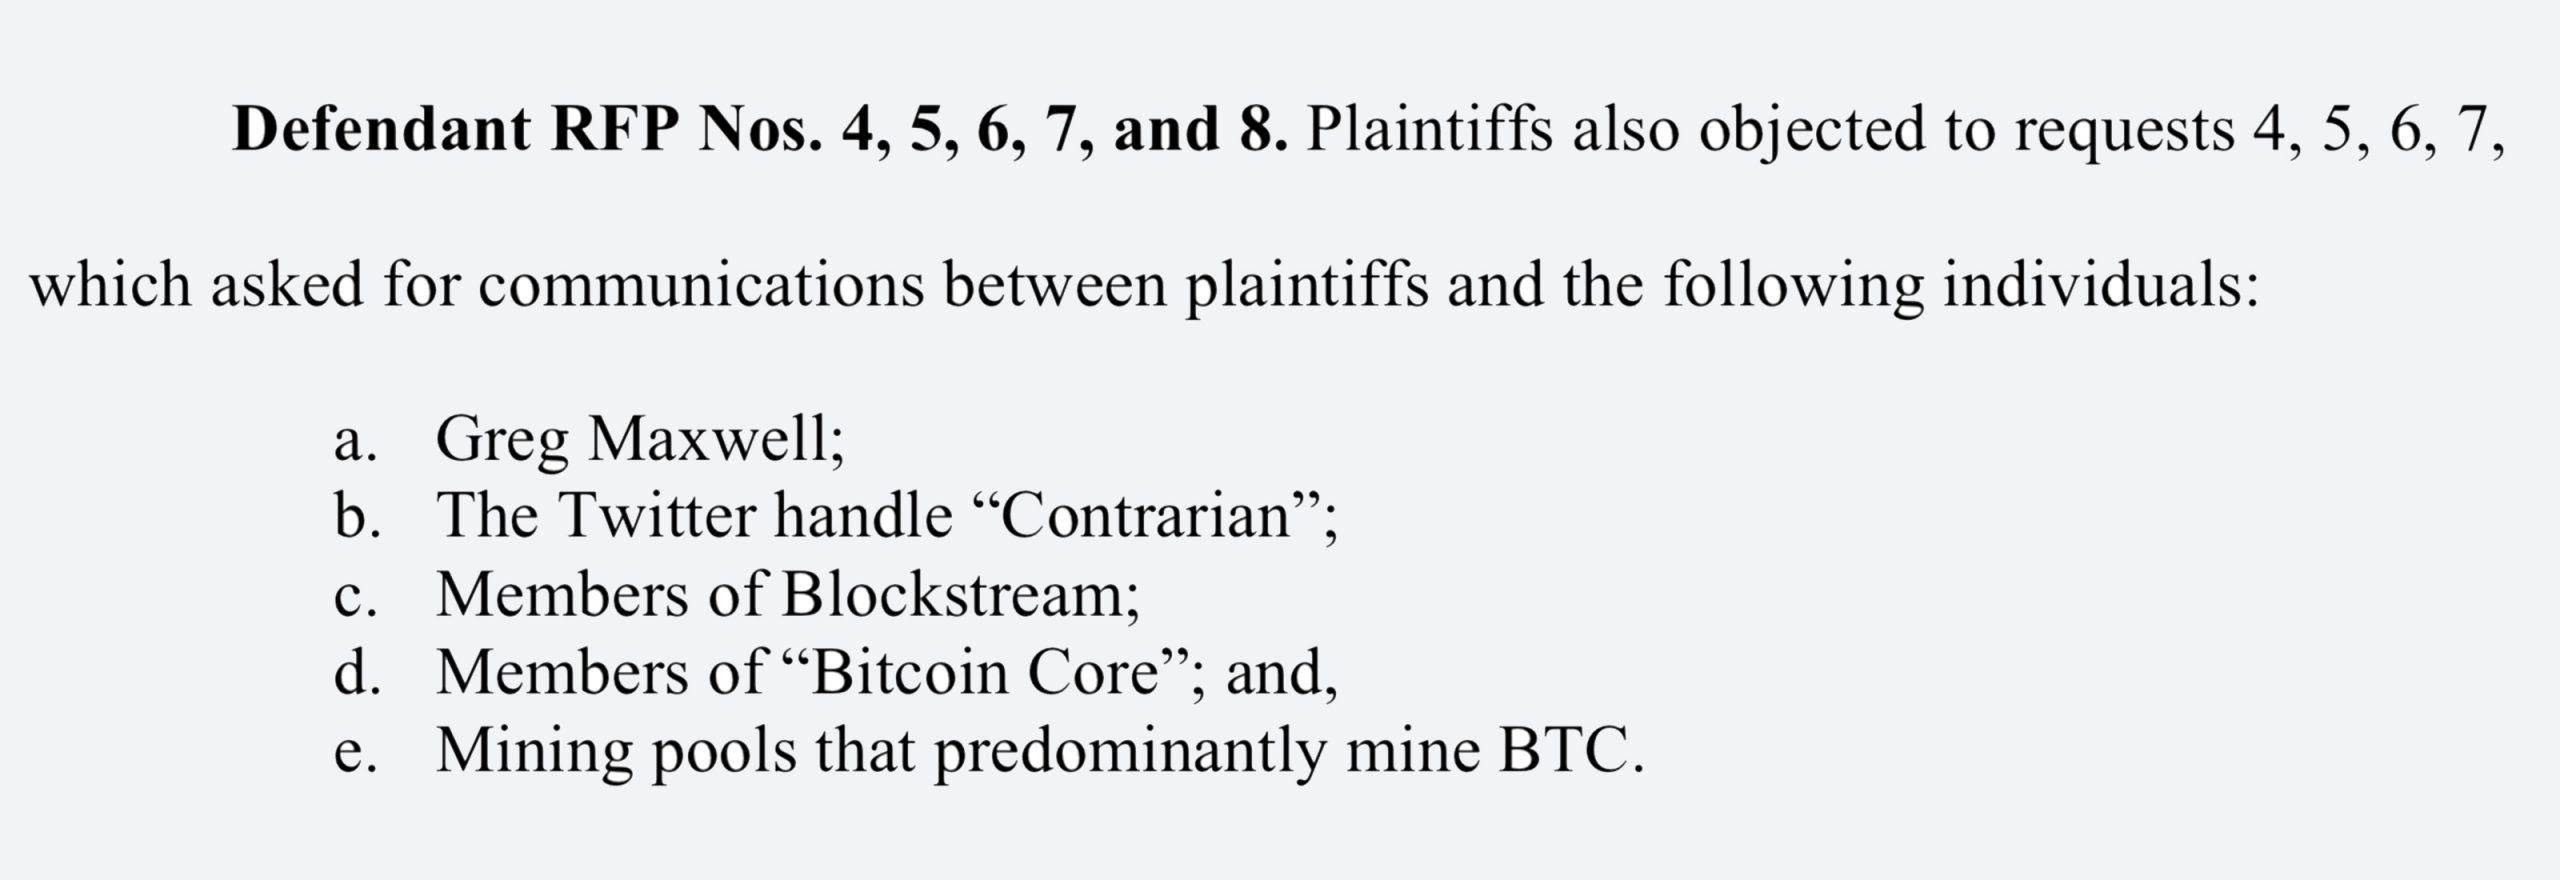 "Craig Wright intenta ""revelar el origen"" del nombre de Satoshi Nakamoto ""width ="" 2560 ""height ="" 880 ""srcset ="" https: //news.bitcoin. com / wp-content / uploads / 2019/12 / communi-scaled.jpg 2560w, https://news.bitcoin.com/wp-content/uploads/2019/12/communi-300x103.jpg 300w, https: // news.bitcoin.com/wp-content/uploads/2019/12/communi-1024x352.jpg 1024w, https://news.bitcoin.com/wp-content/uploads/2019/12/communi-768x264.jpg 768w, https://news.bitcoin.com/wp-content/uploads/2019/12/communi-1536x528.jpg 1536w, https://news.bitcoin.com/wp-content/uploads/2019/12/communi-2048x704 .jpg 2048w, https://news.bitcoin.com/wp-content/uploads/2019/12/communi-696x2 39.jpg 696w, https://news.bitcoin.com/wp-content/uploads/2019/12/communi-1392x479.jpg 1392w, https://news.bitcoin.com/wp-content/uploads/2019/ 12 / communi-1068x367.jpg 1068w, https://news.bitcoin.com/wp-content/uploads/2019/12/communi-1222x420.jpg 1222w, https://news.bitcoin.com/wp-content/ uploads / 2019/12 / communi-1920x660.jpg 1920w ""tamaños ="" (ancho máximo: 2560px) 100vw, 2560px"